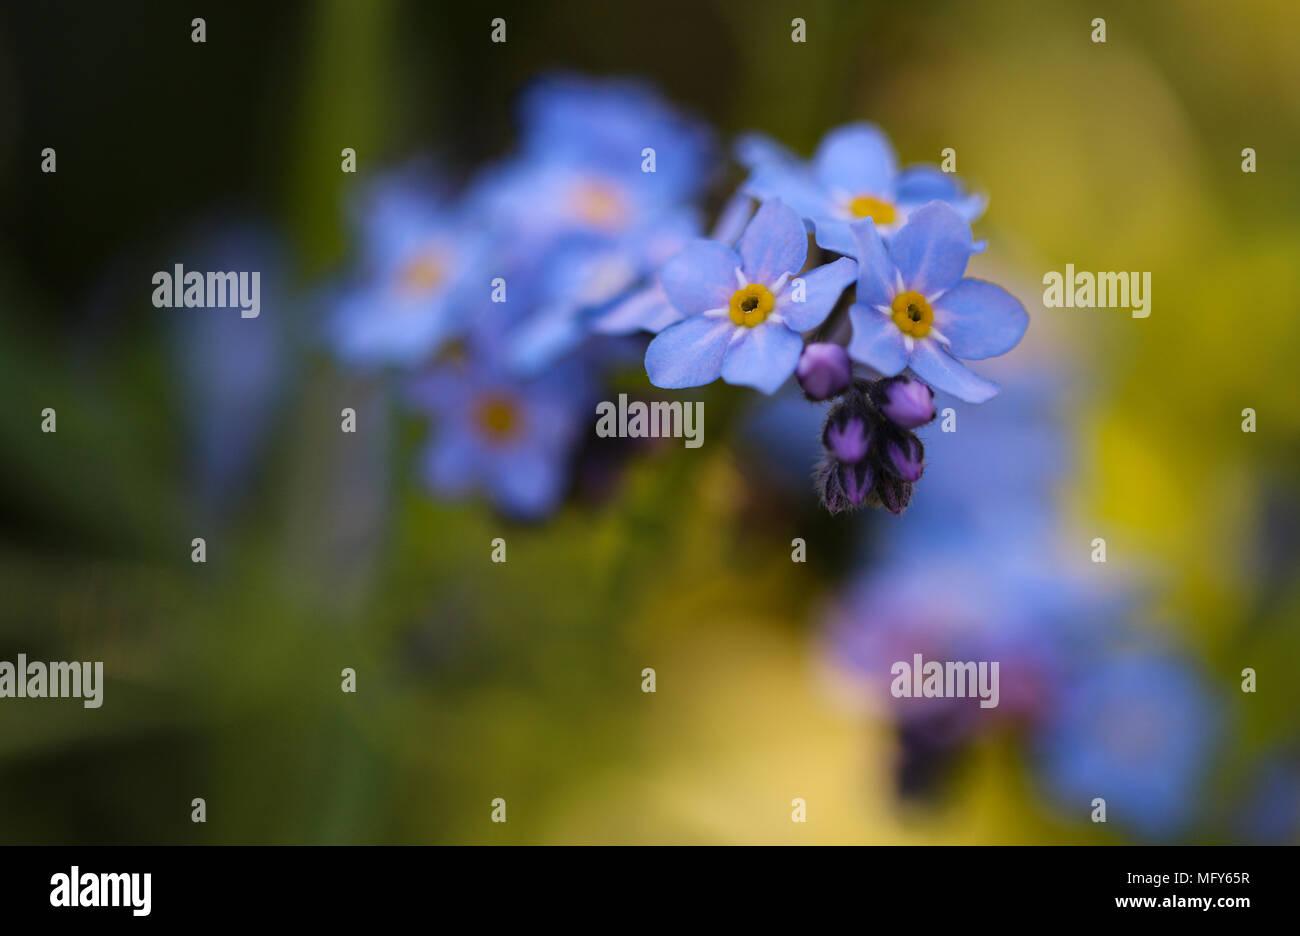 Forget me not myosotis sylviatica macro image showing delicate forget me not myosotis sylviatica macro image showing delicate blue flowers with yellow centre shepperton england uk mightylinksfo